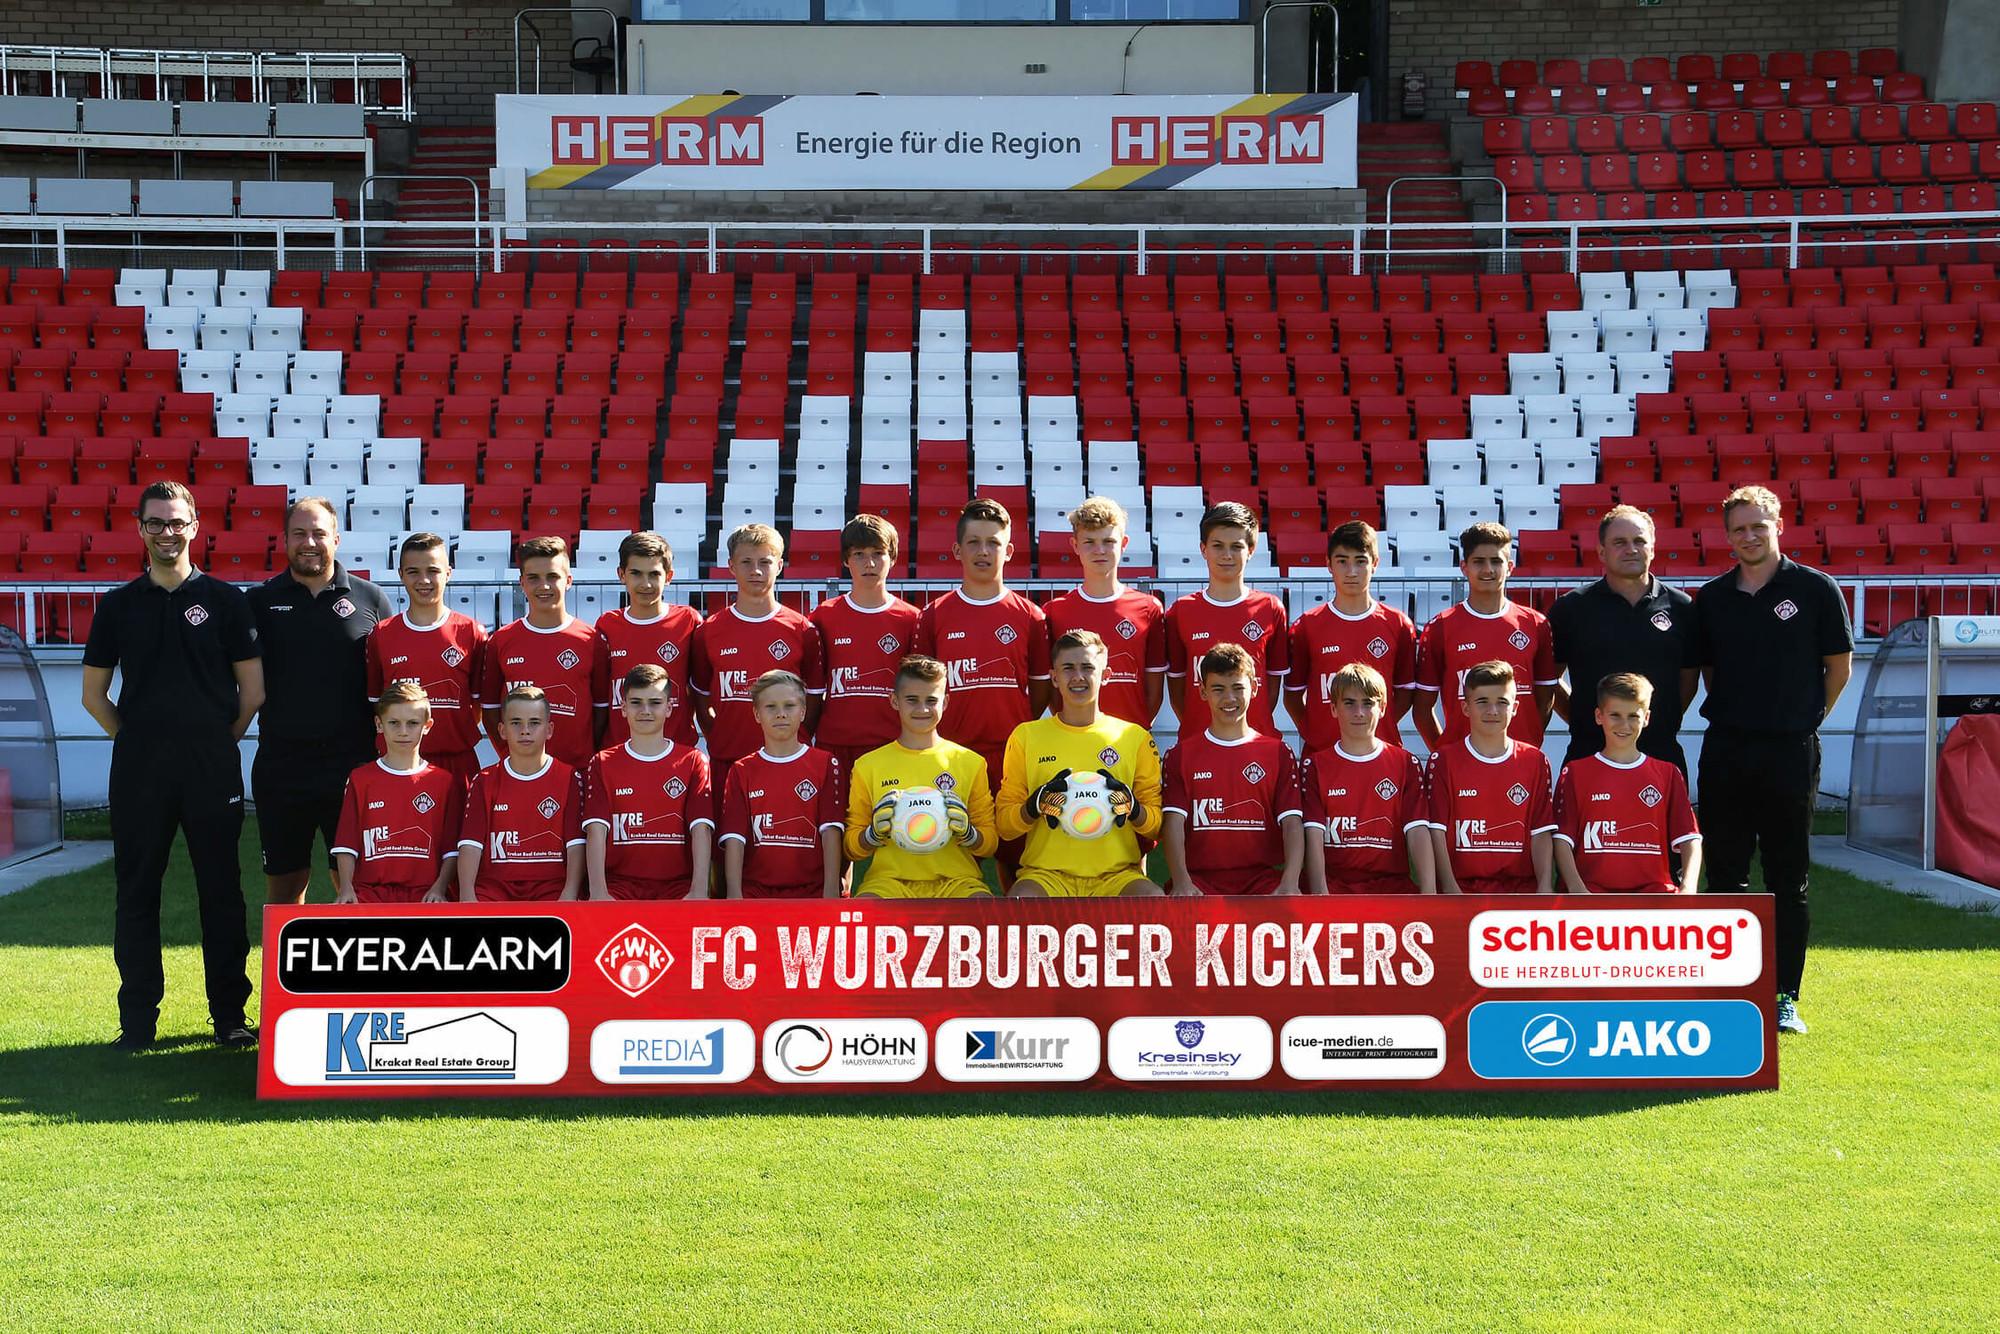 WГјrzburger Kickers News